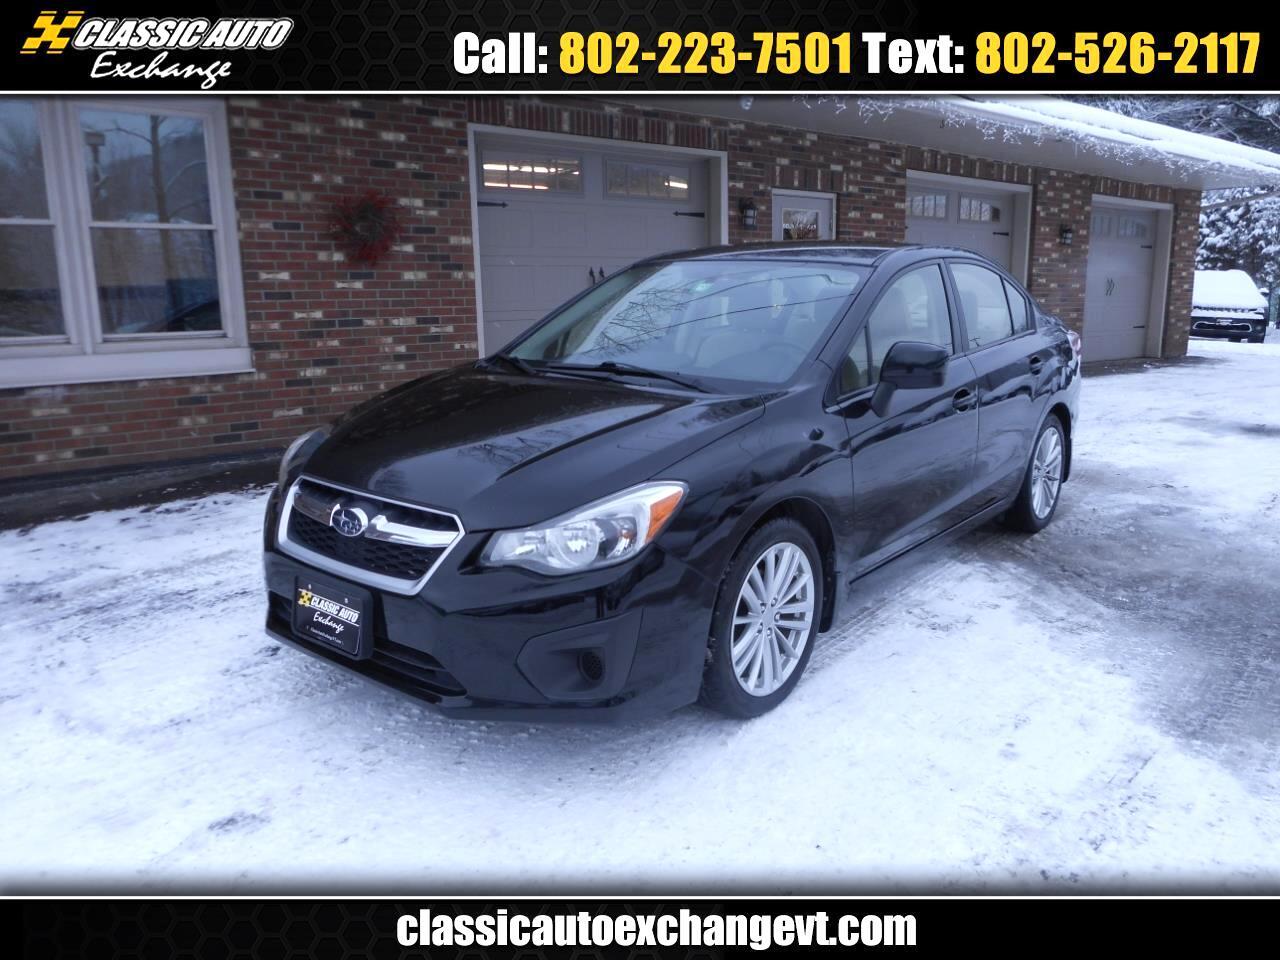 Subaru Impreza 2.0i Premium 4-Door w/All Weather Package 2014